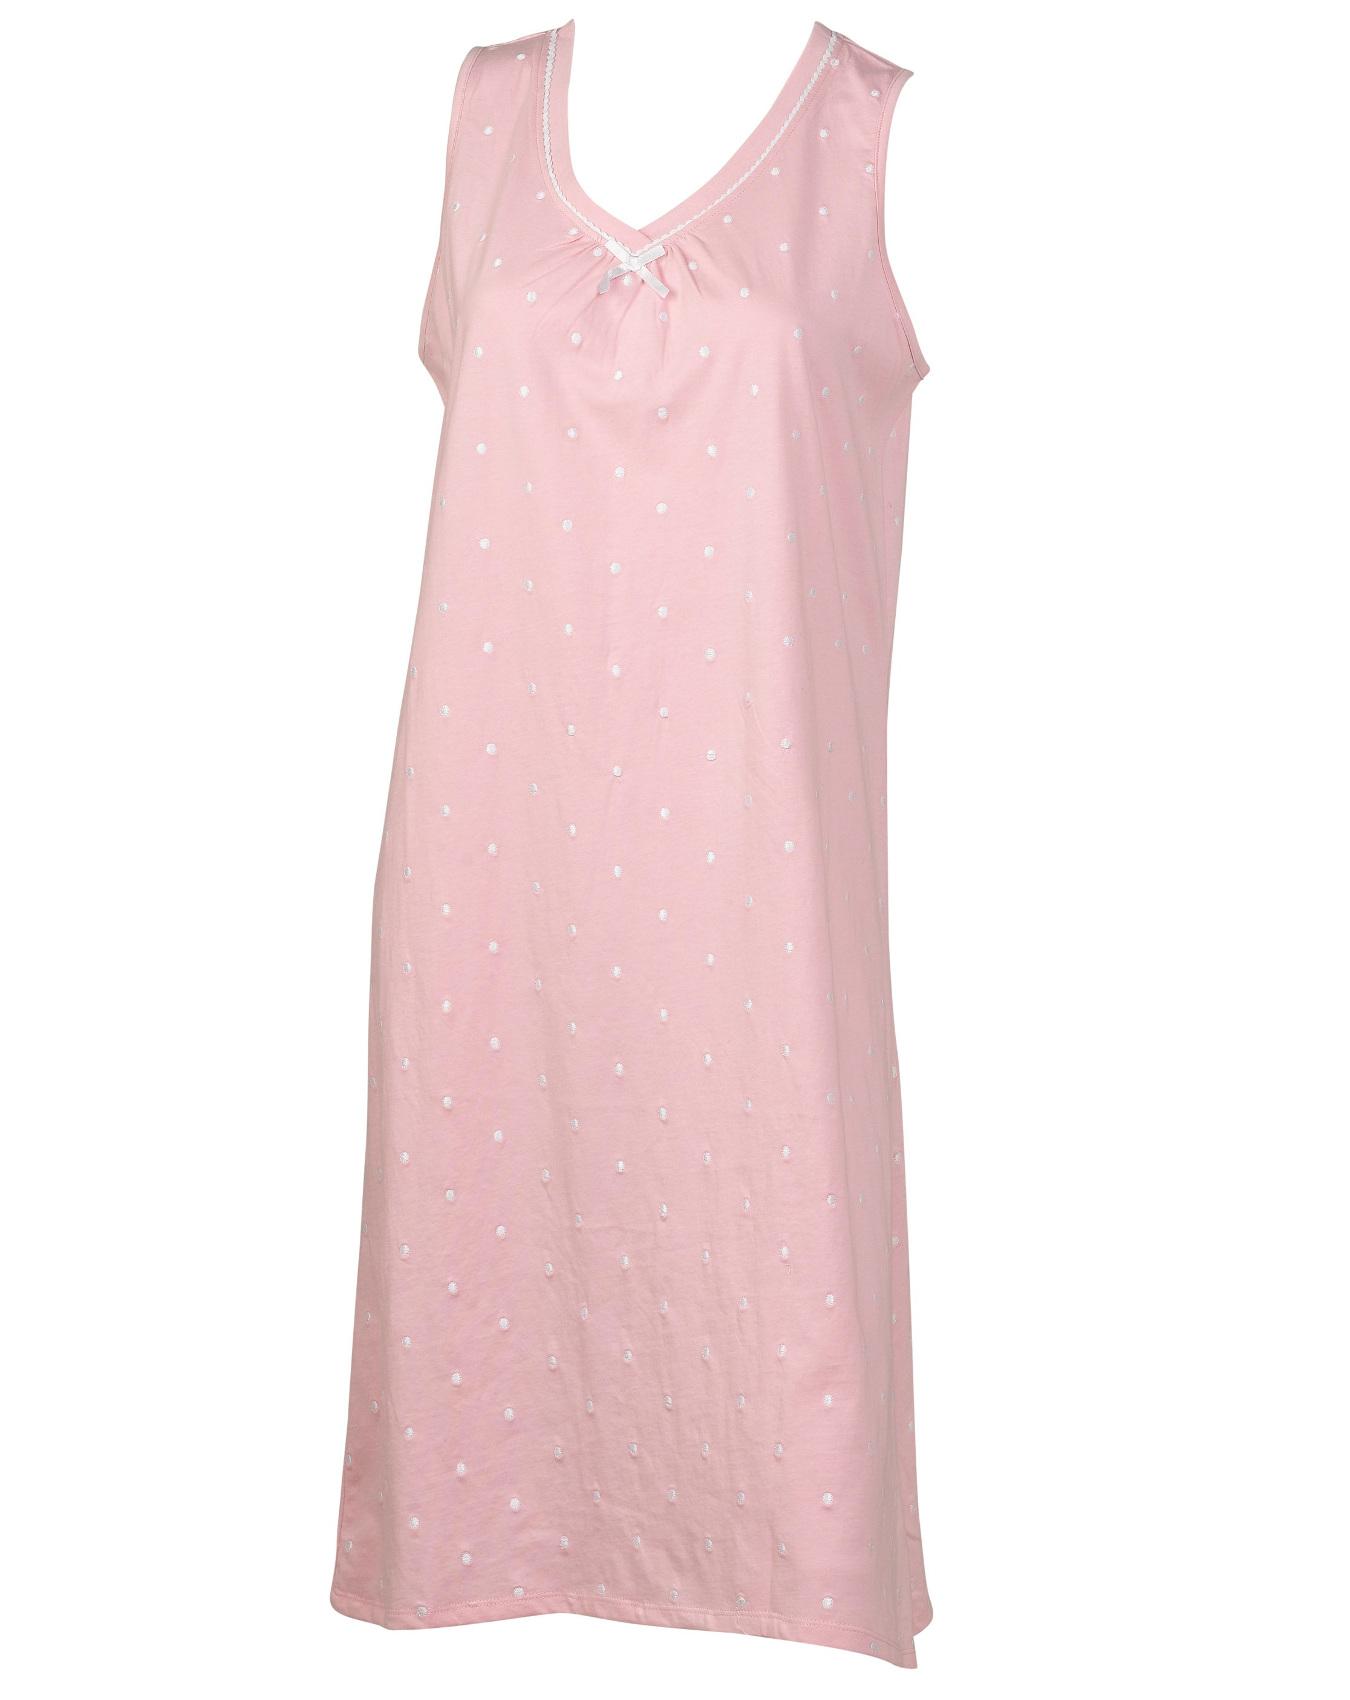 Nightdress 100% Cotton Dobby Dot Sleeveless Nightgown Womens Slenderella  Nightie 2d07a473f2